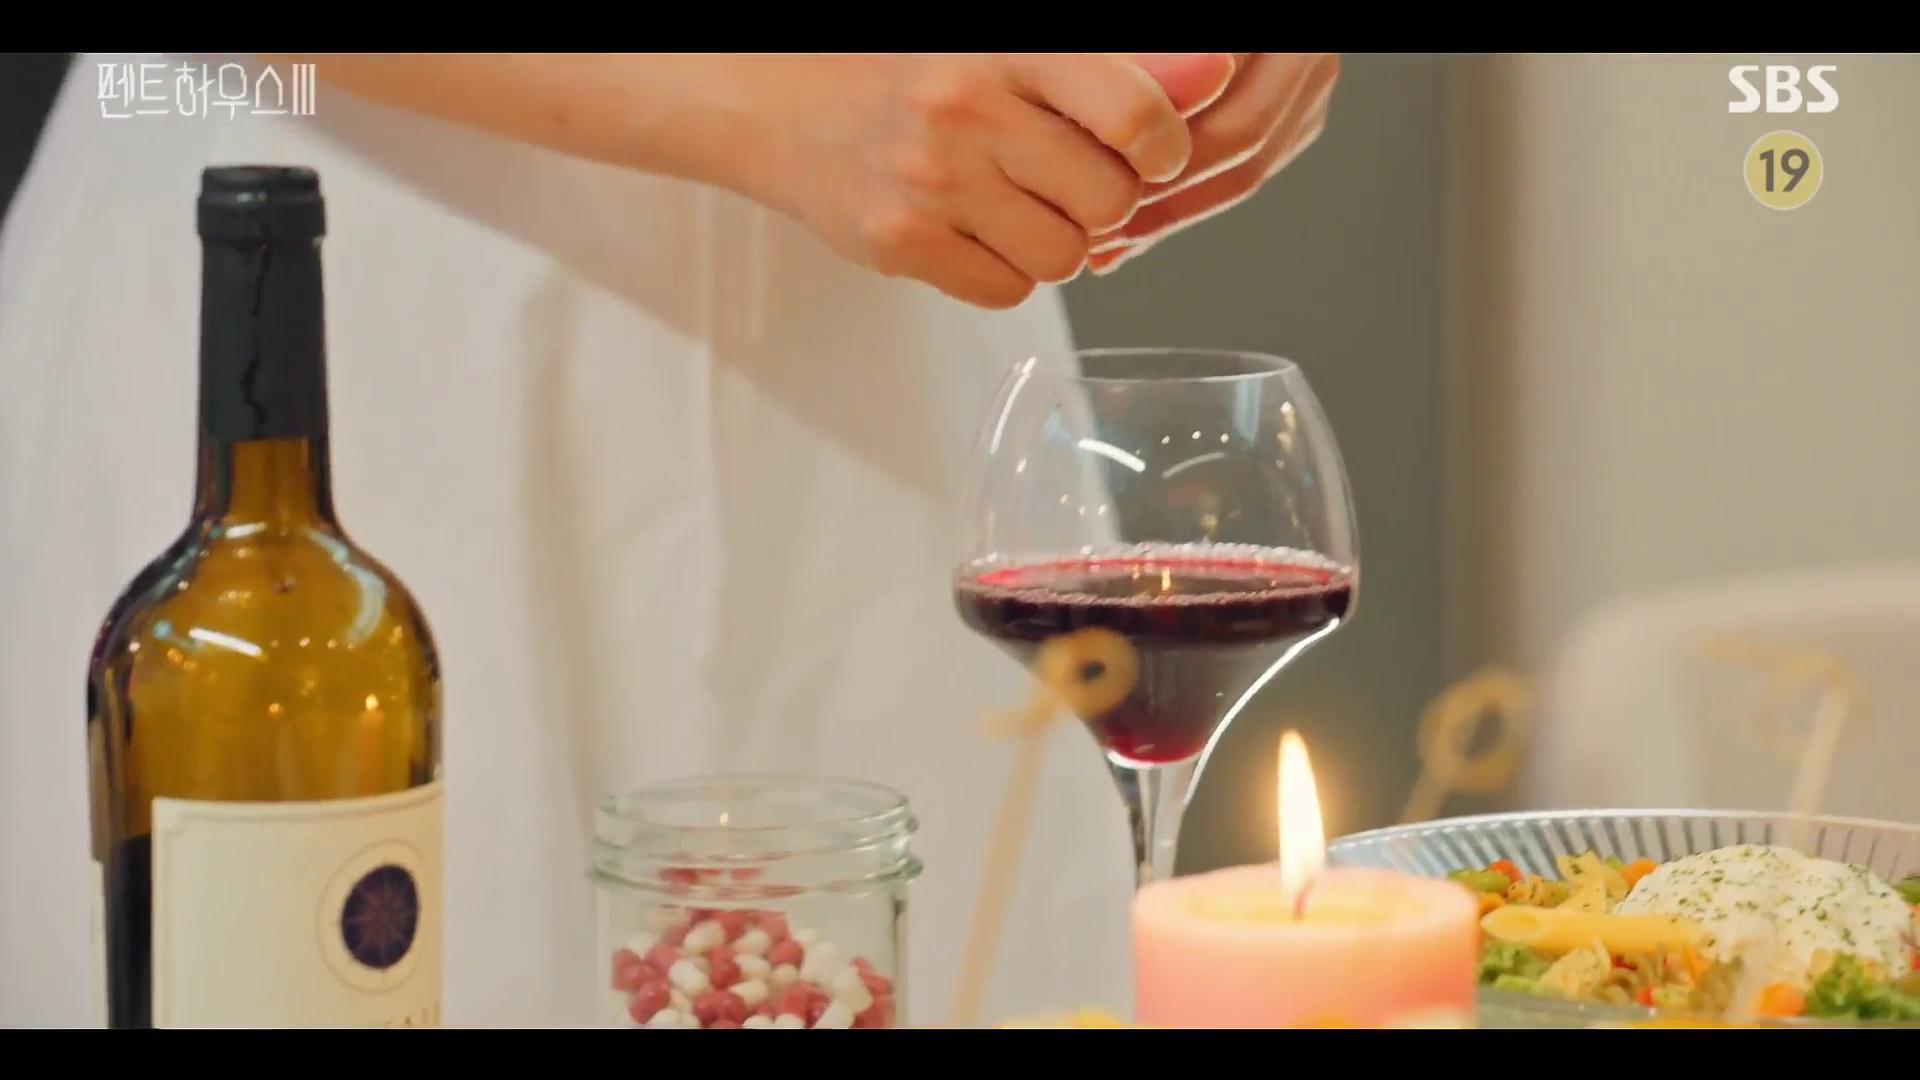 Penthouse 3: Why did Eun Byeol Drug Cheon Seo Jin?